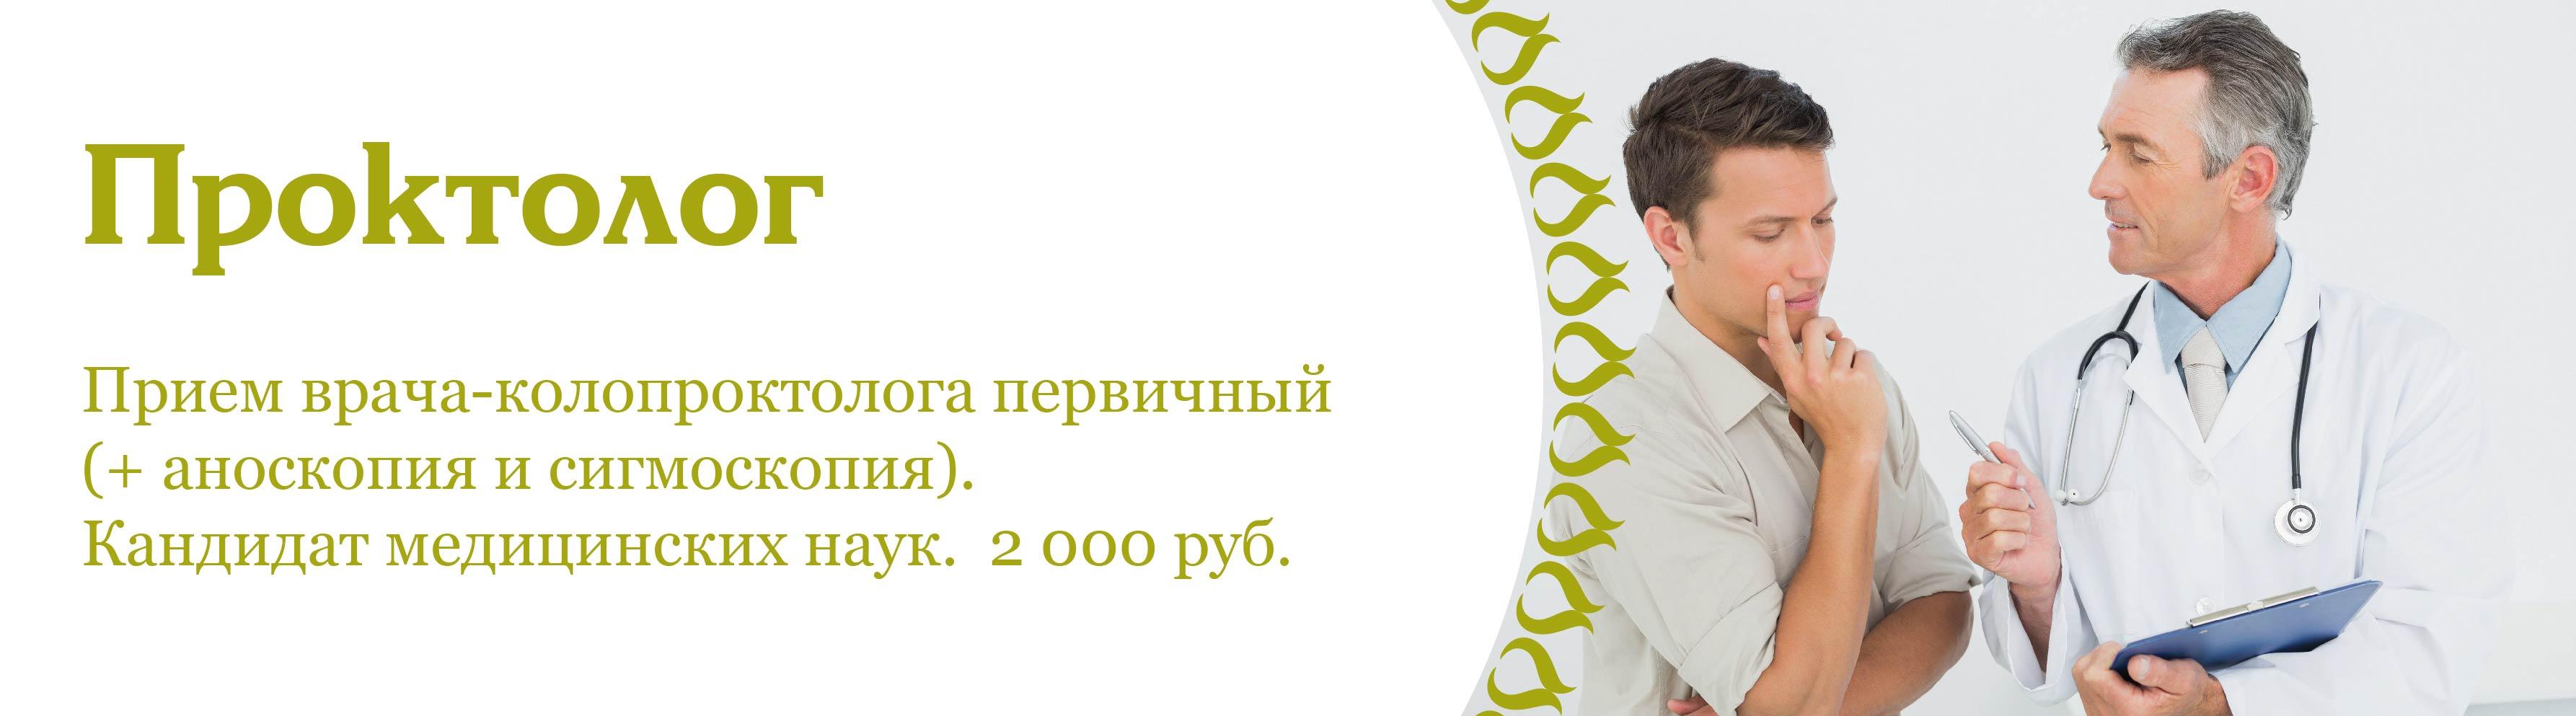 консультация проктолога в москве